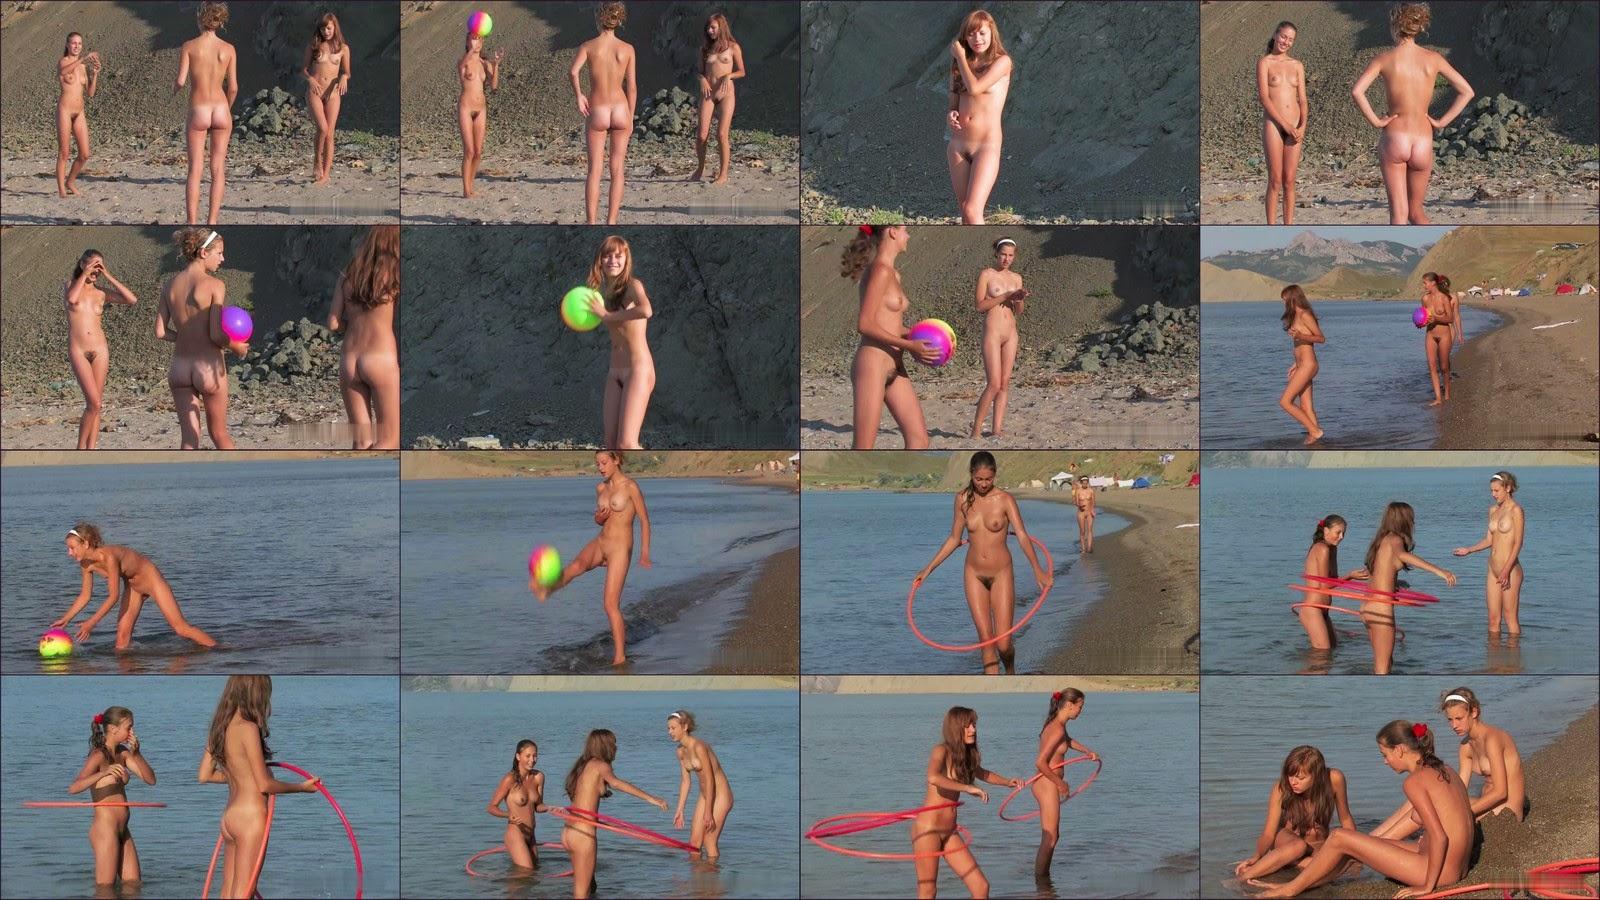 Naturist Girlfriends 2. Full version.